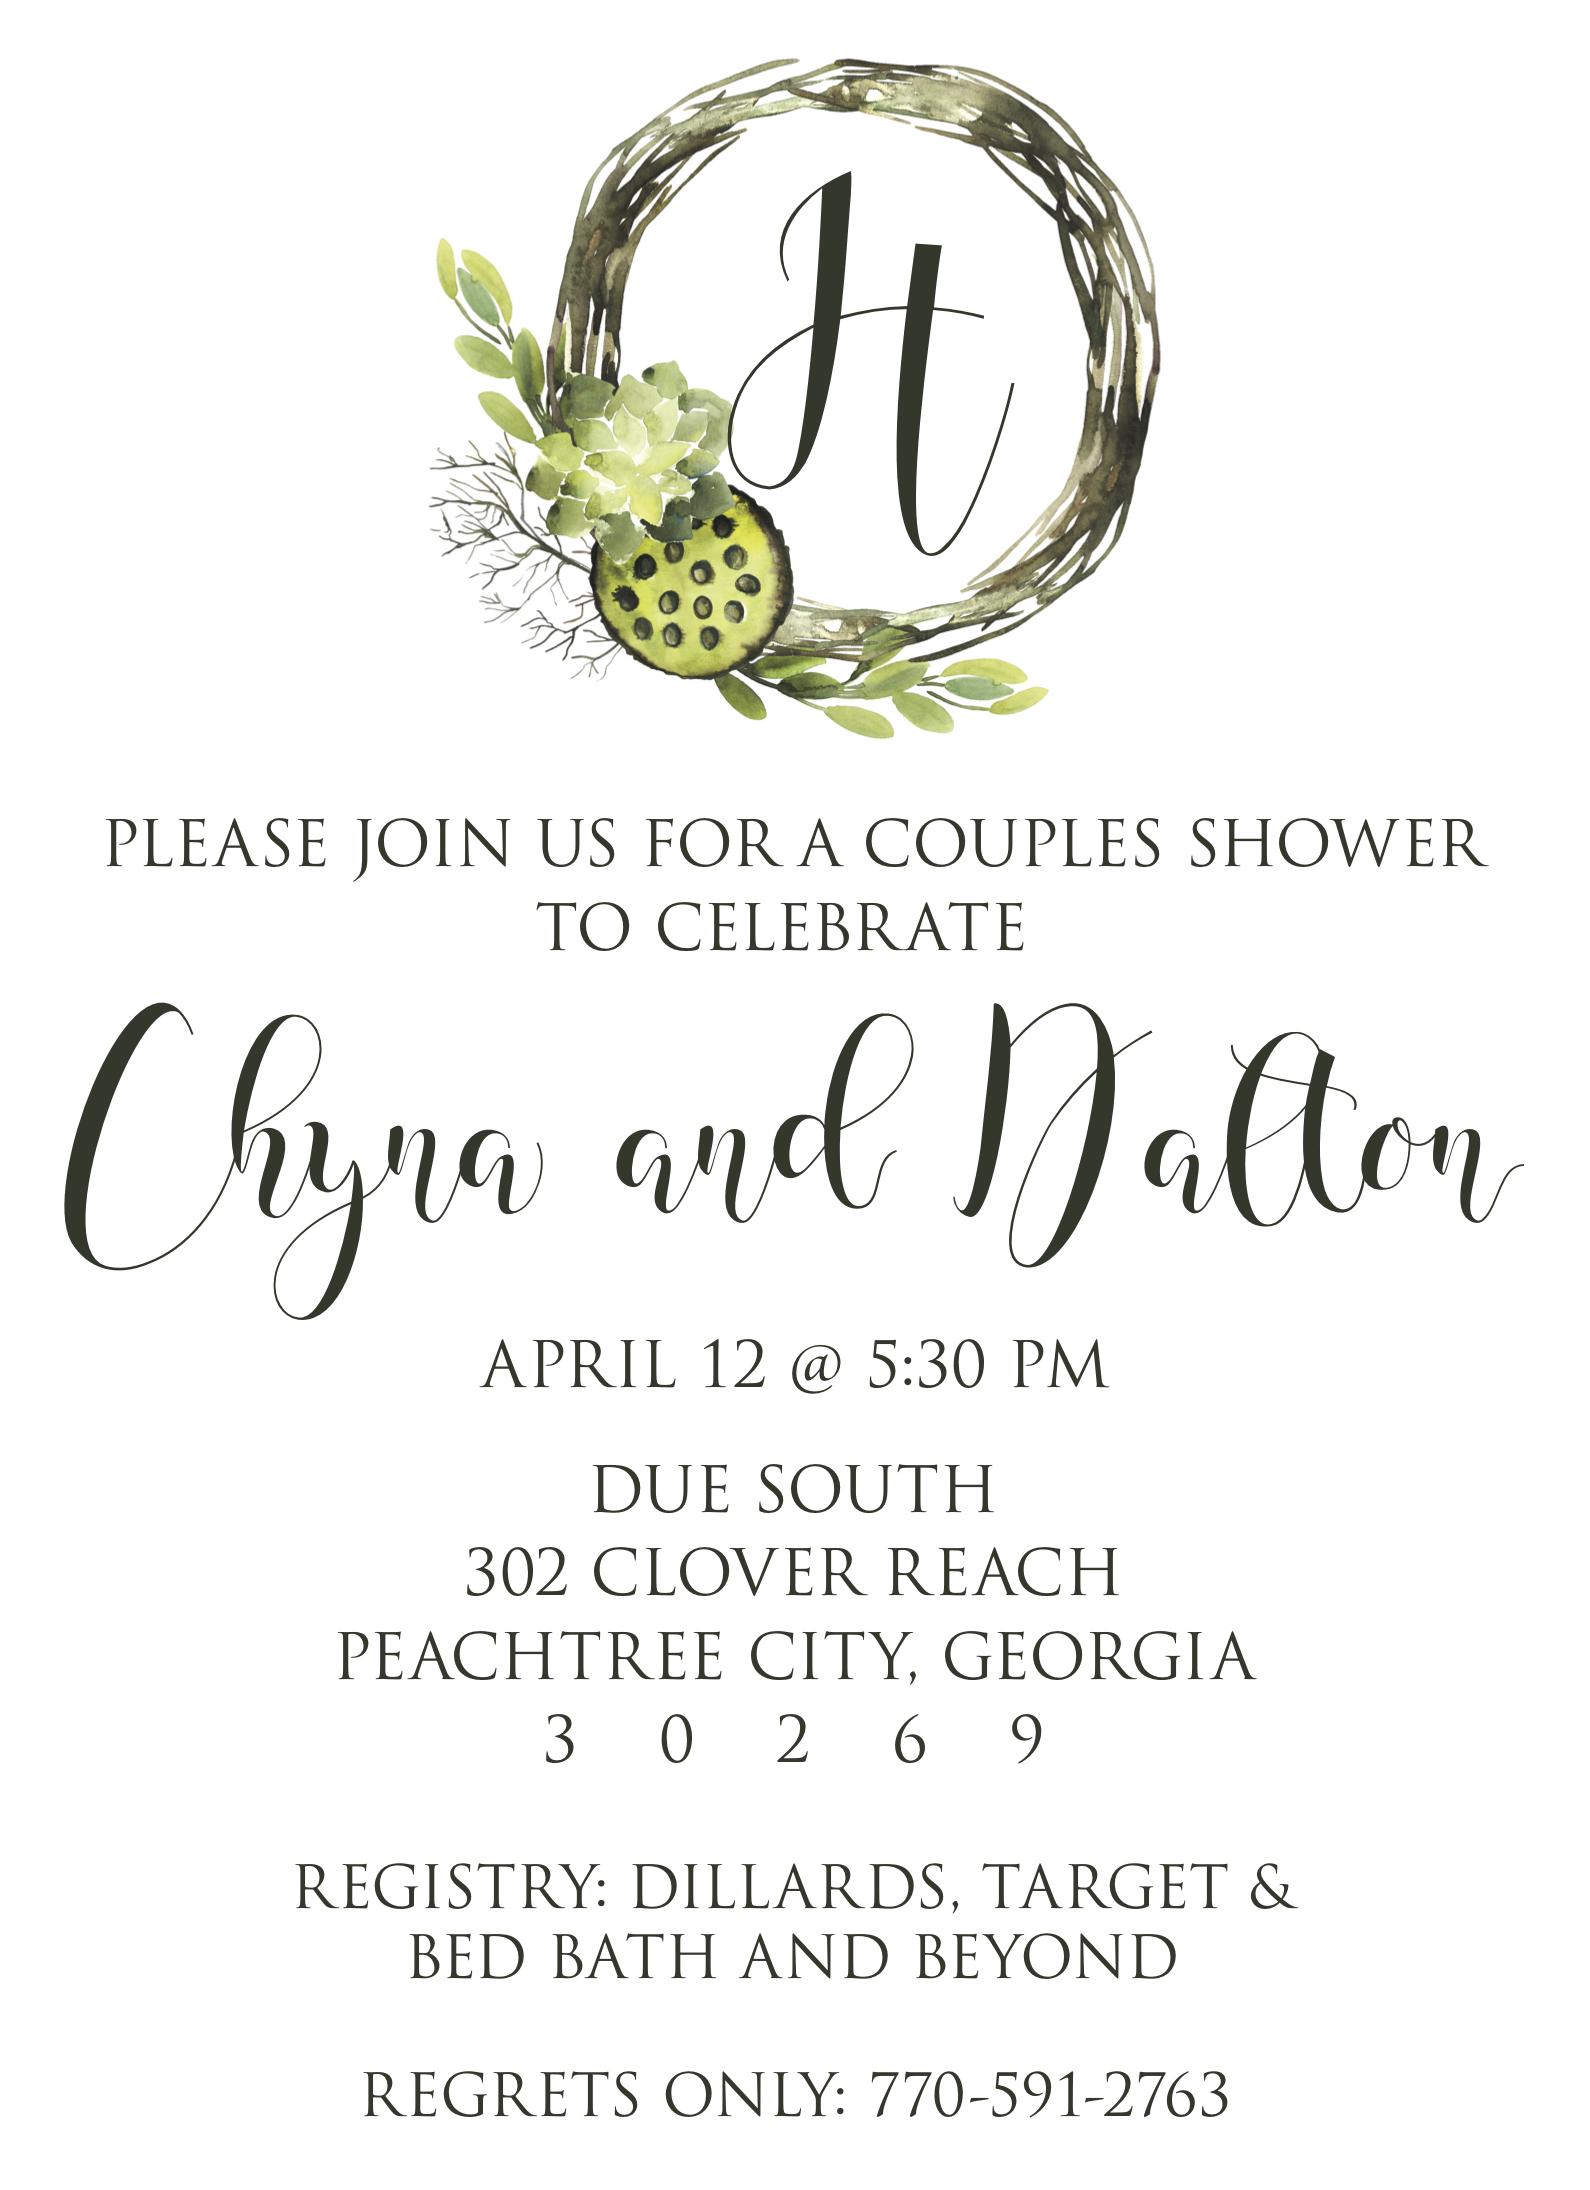 Wedding Shower Template 1.jpg